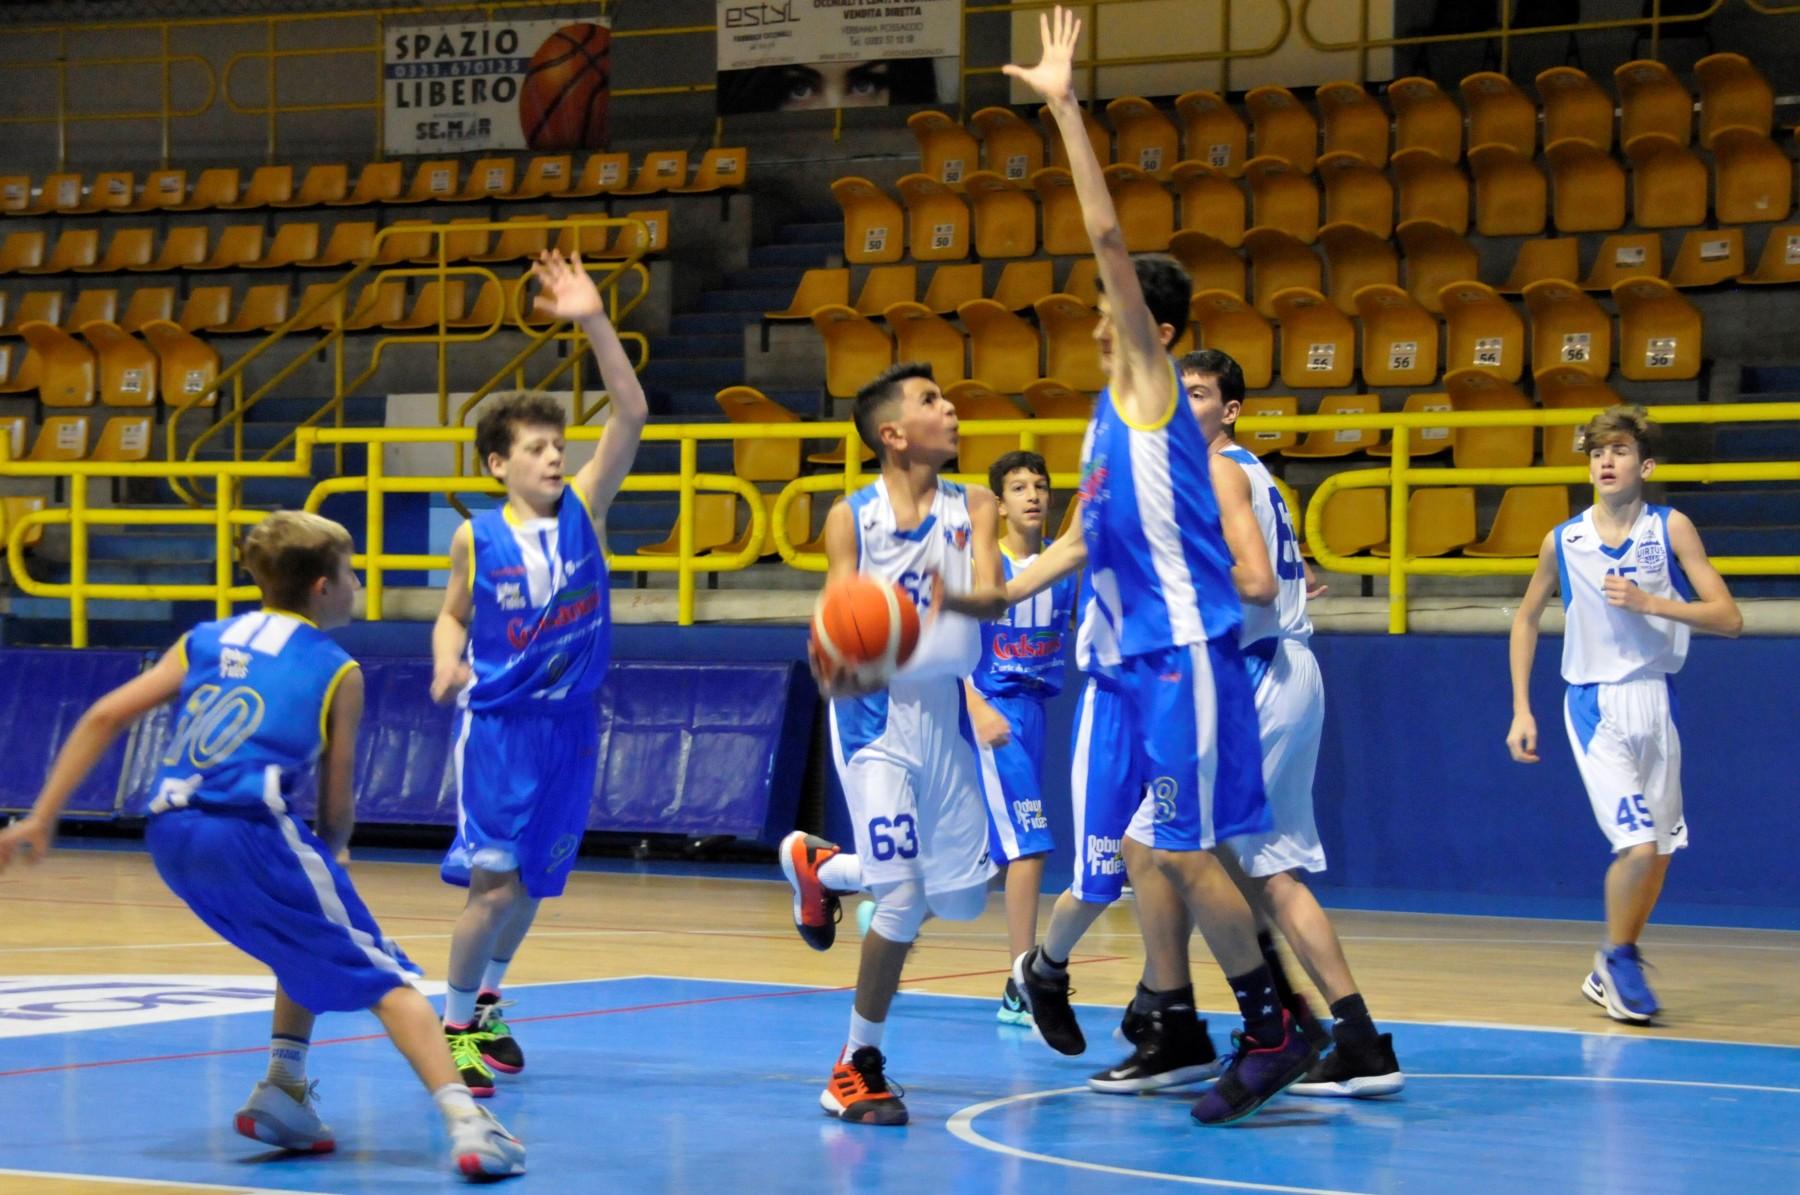 Virtus-Robur-Varese-U13-2019-12-21_034